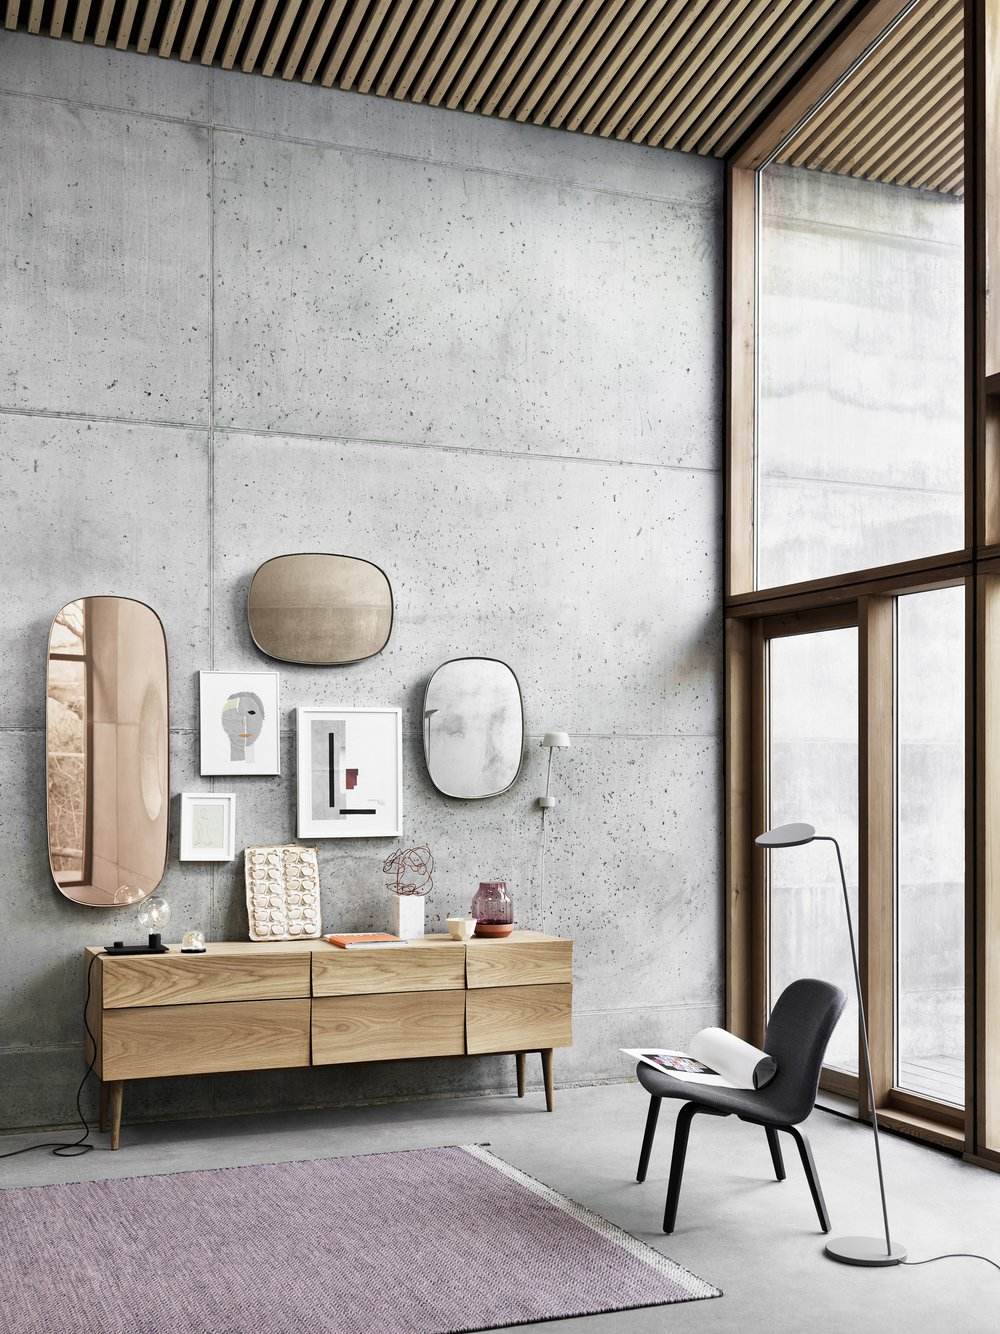 Framed_Mirrors_Reflect_Sideboard_Lean_Lamp_Ply_Rose_Visu_Lounge_Umami_743_med-res.jpg